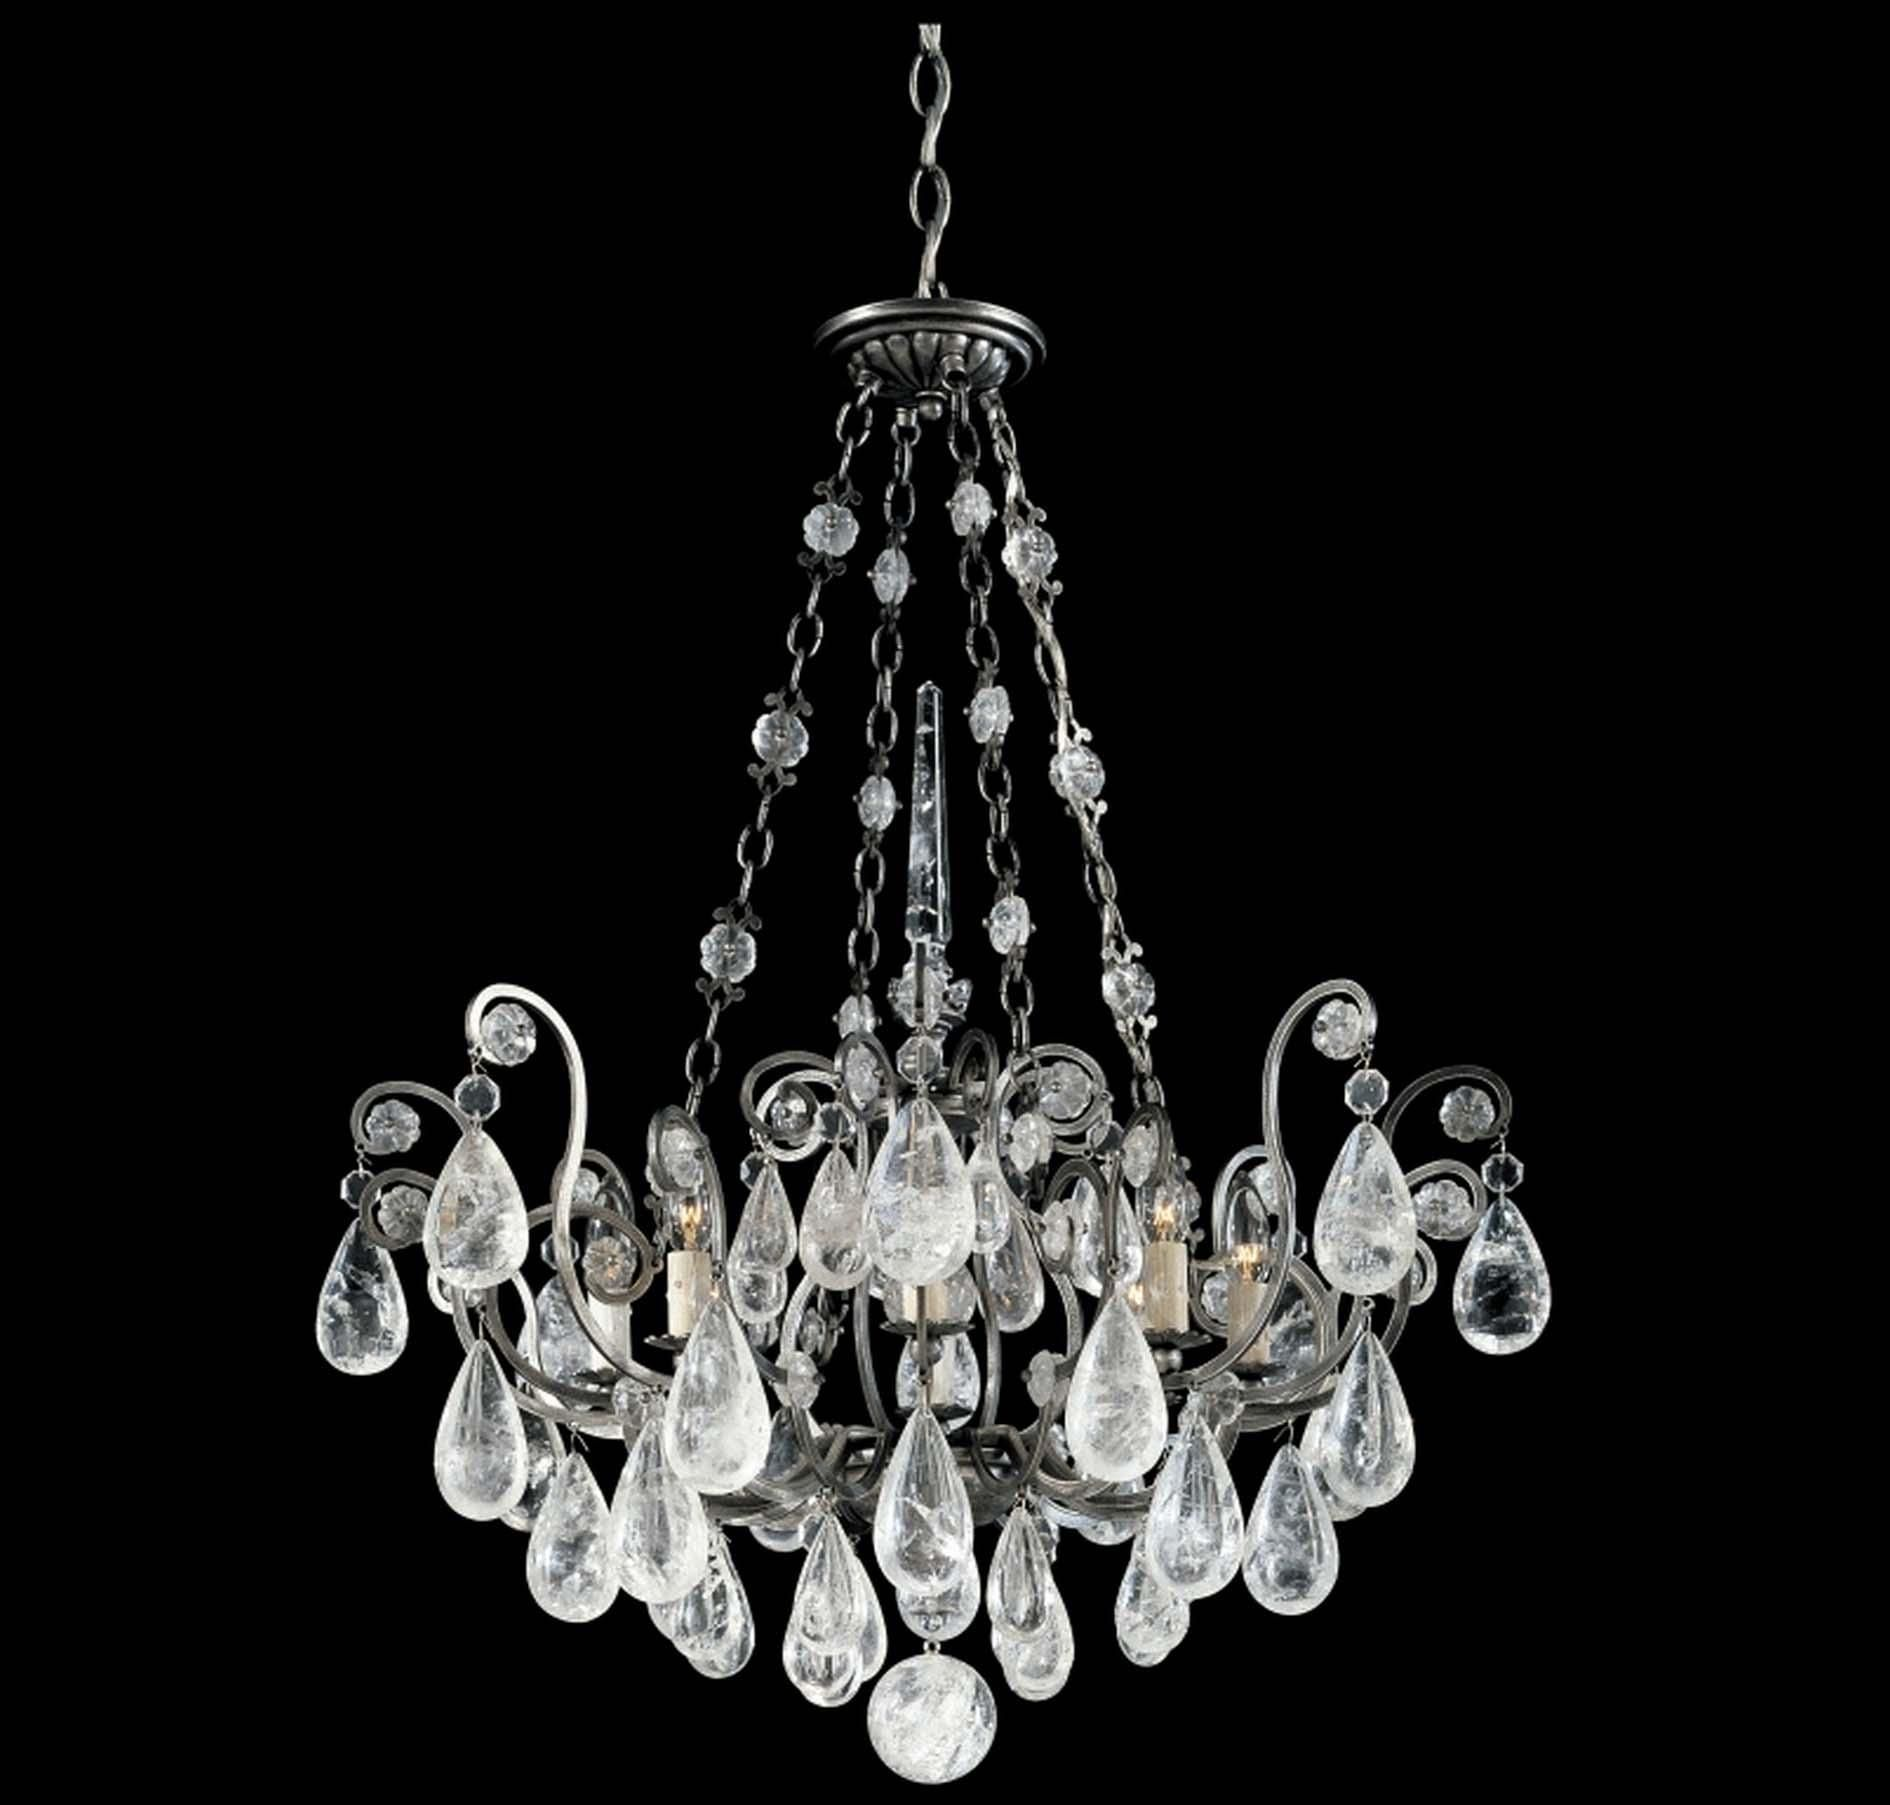 Schonbek Versailles 8-Light Antique Pewter Chandelier | Antique ...